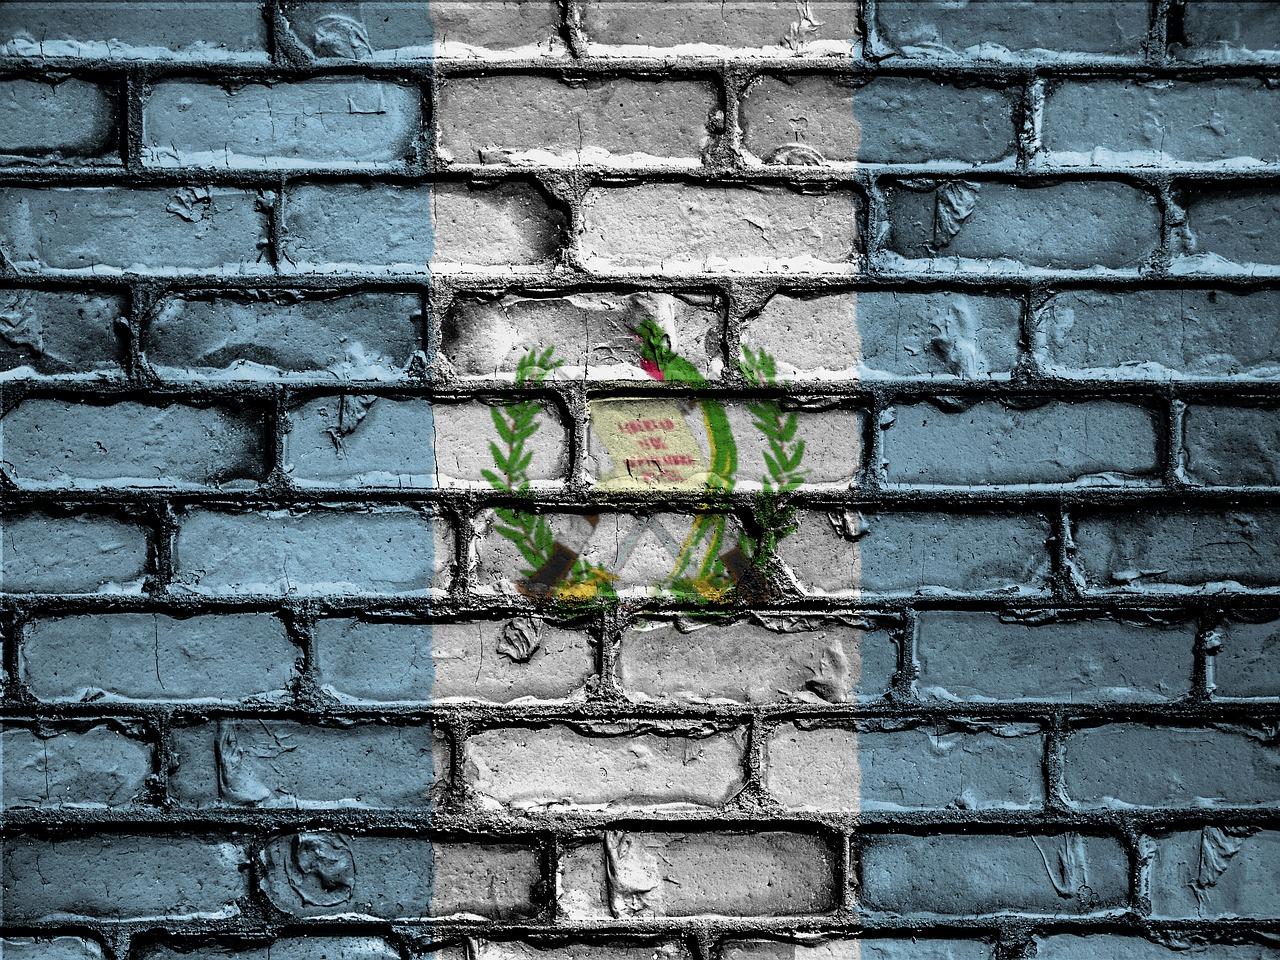 Guatemala top court blocks UN team's removal